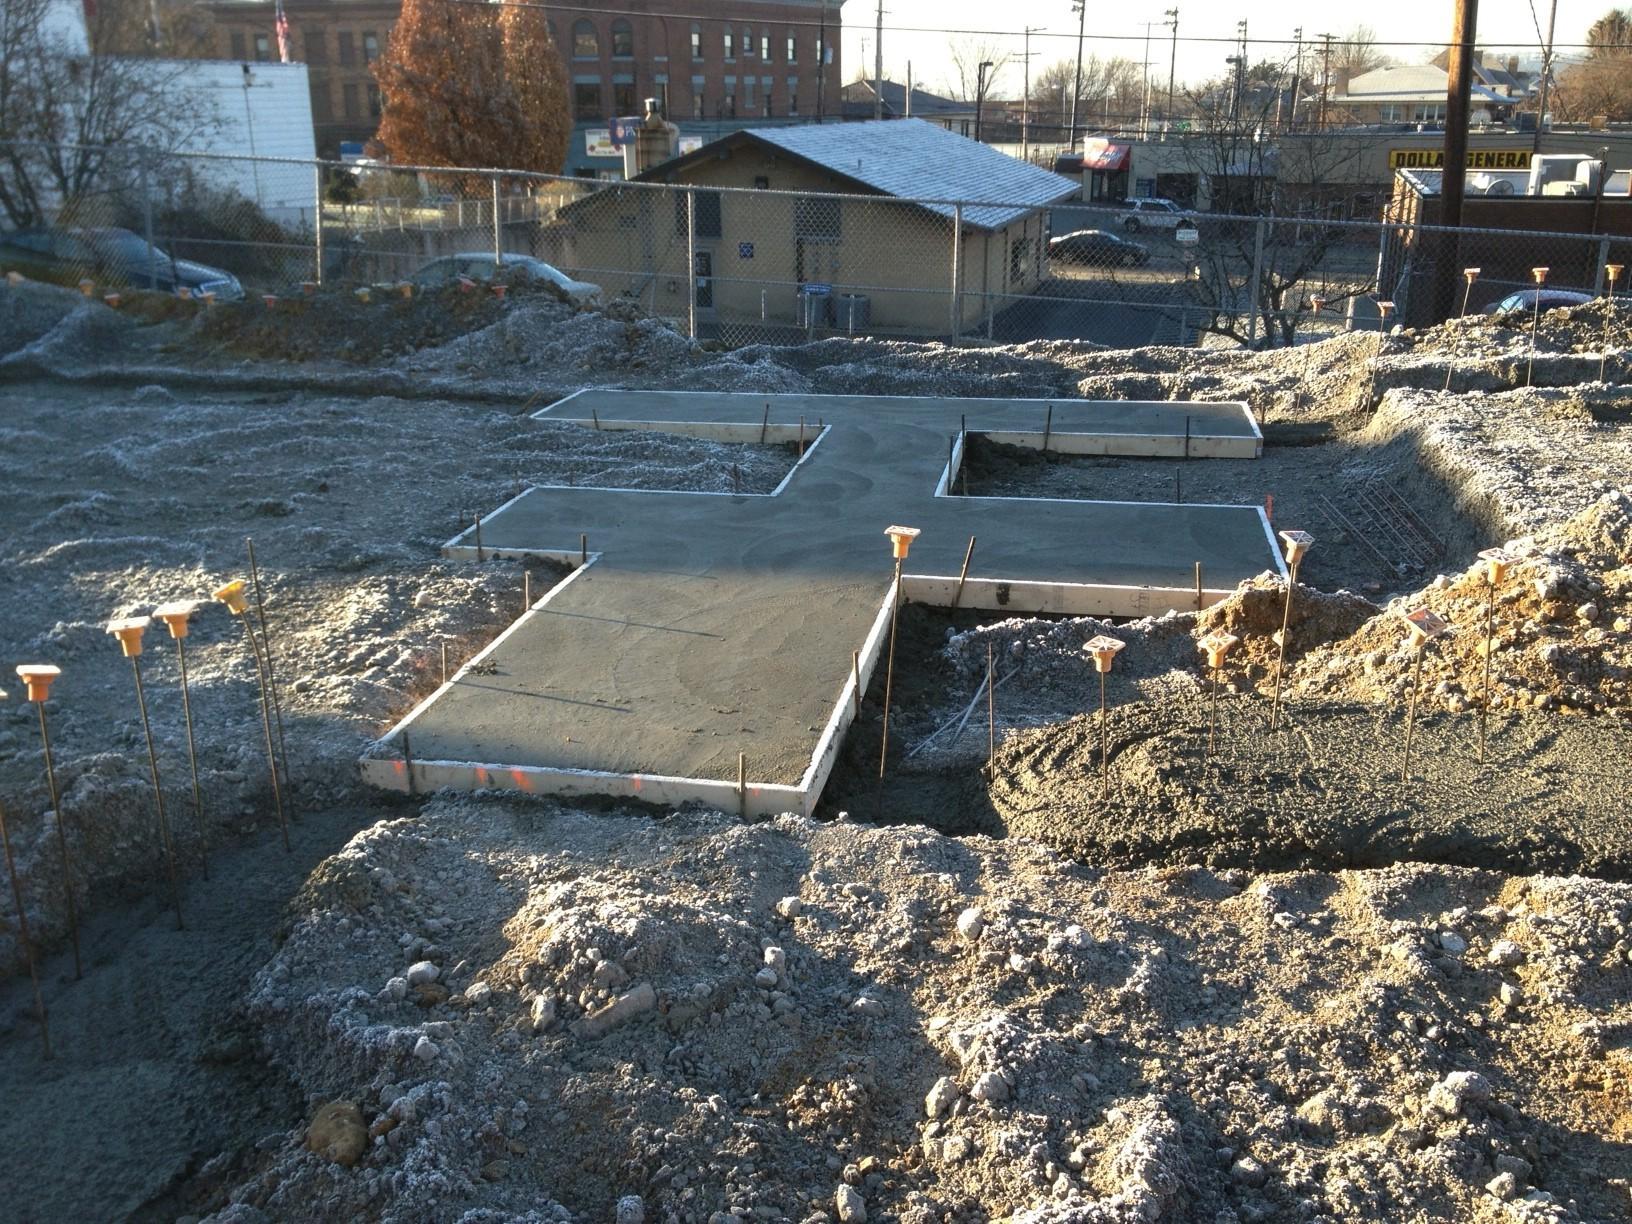 Concrete Foundation Work : Phase cement foundation work bellevue pa skate plaza